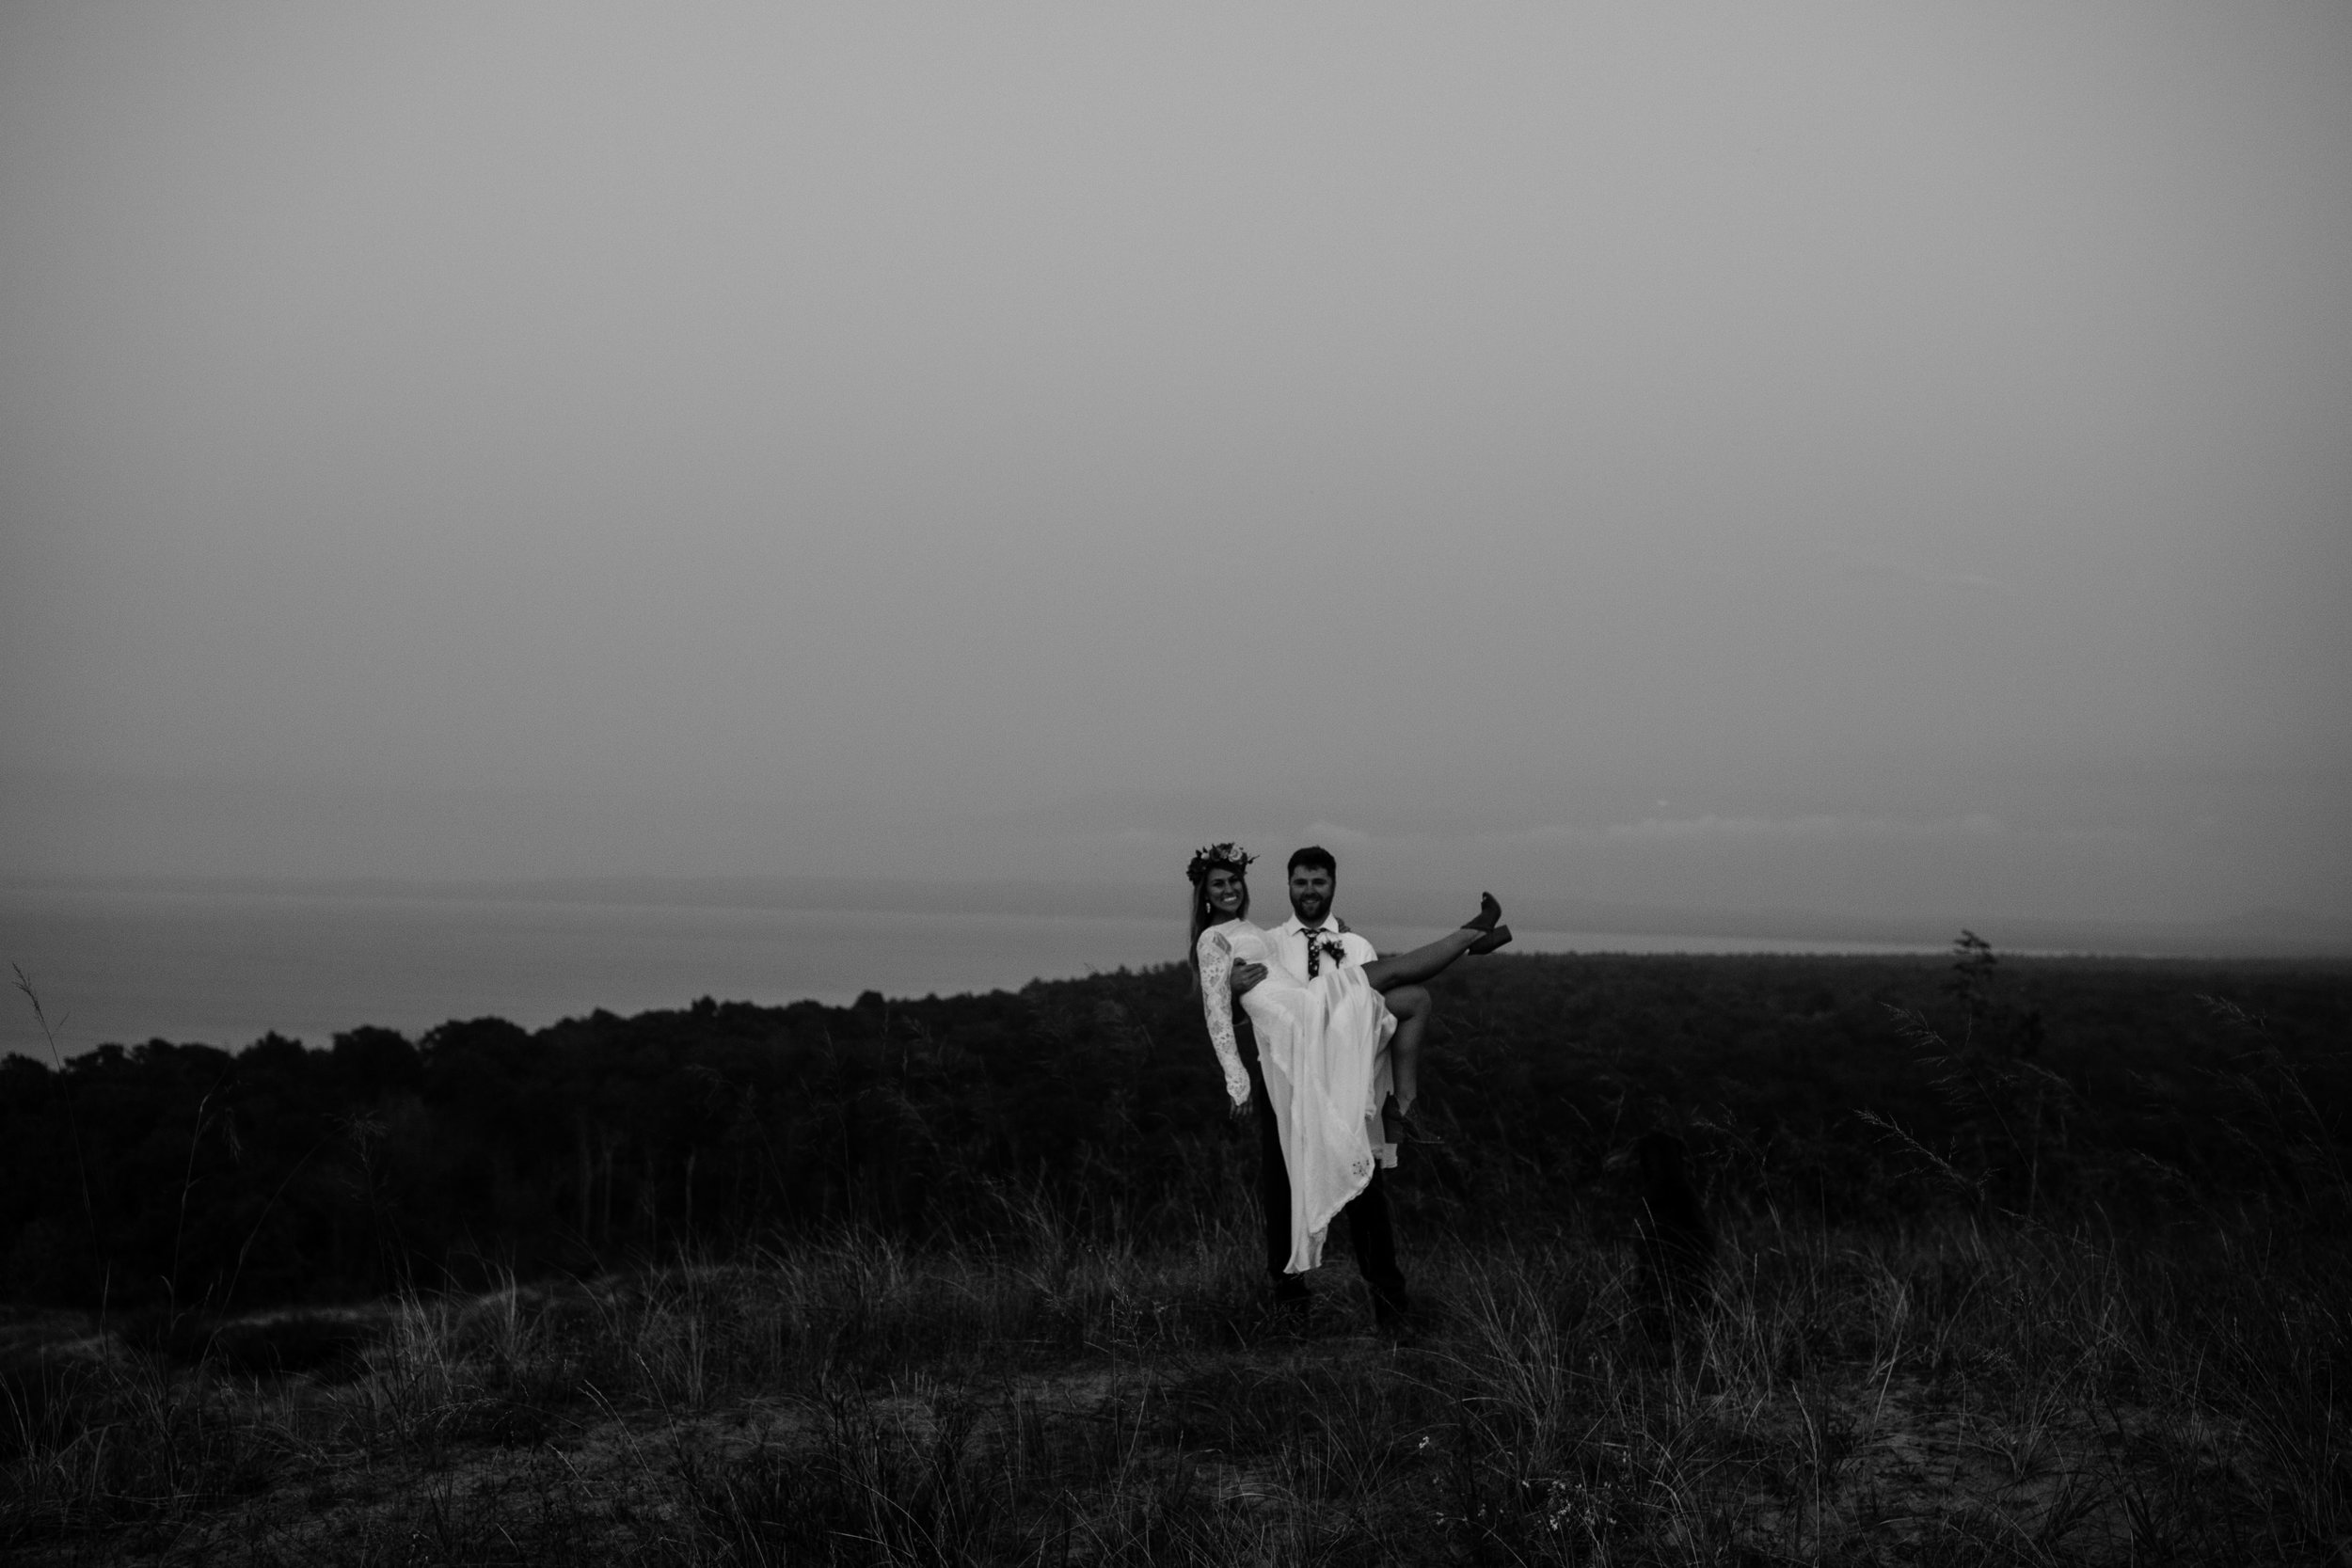 michigan-emotive-photographer-moonlight-elopement-mariha-hunter-226.jpg